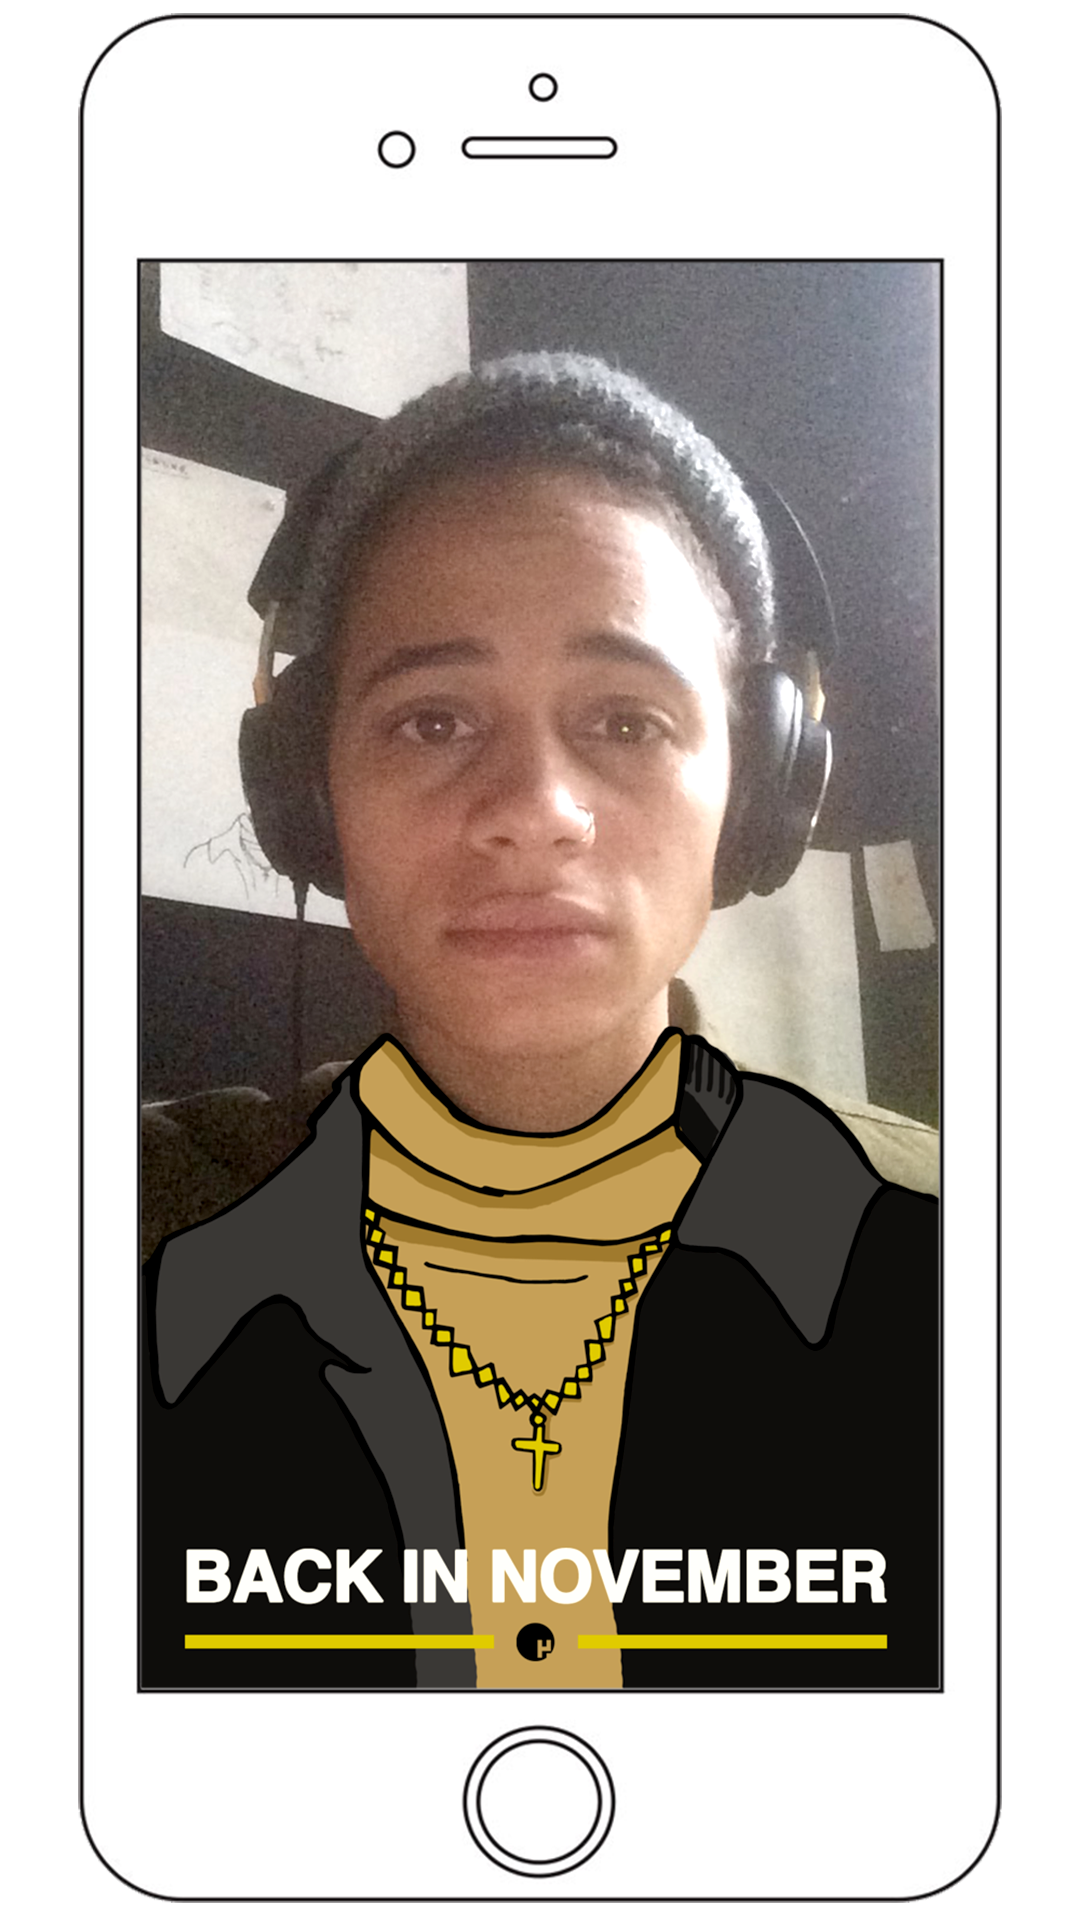 wyclef jean_snapchat custom1.png